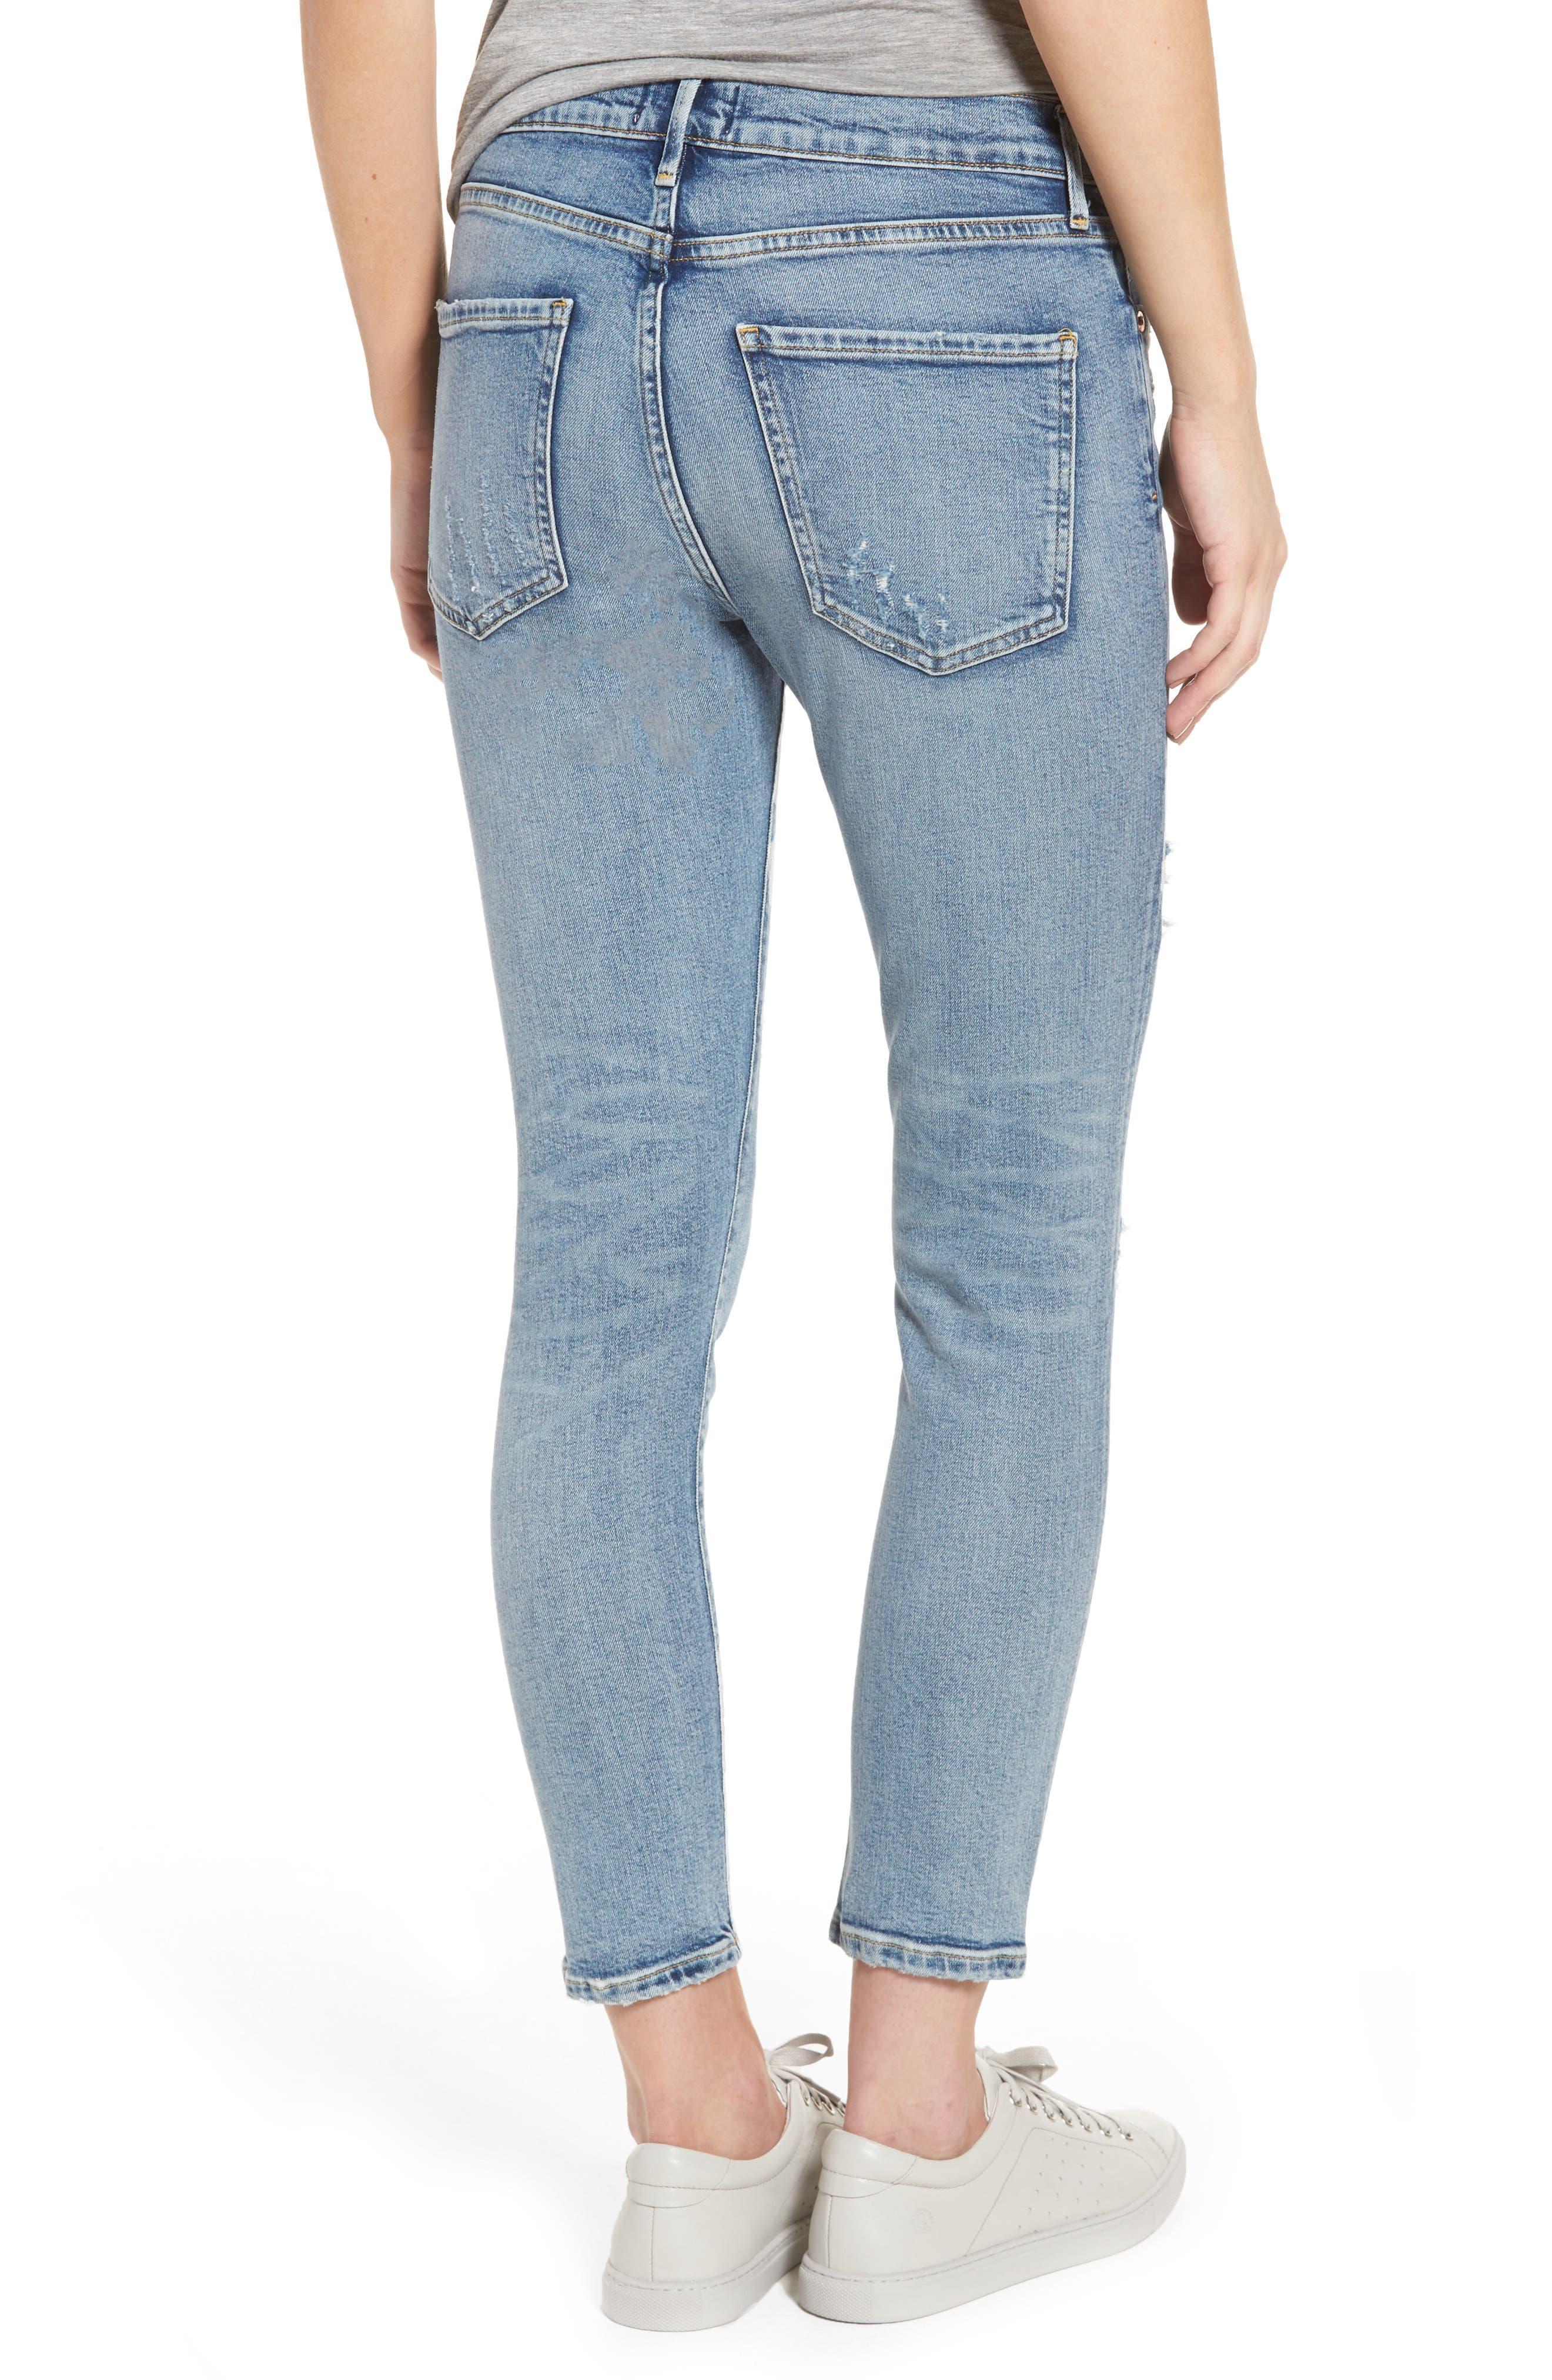 Alternate Image 2  - AGOLDE Sophie Distressed High Waist Skinny Jeans (Outsider)